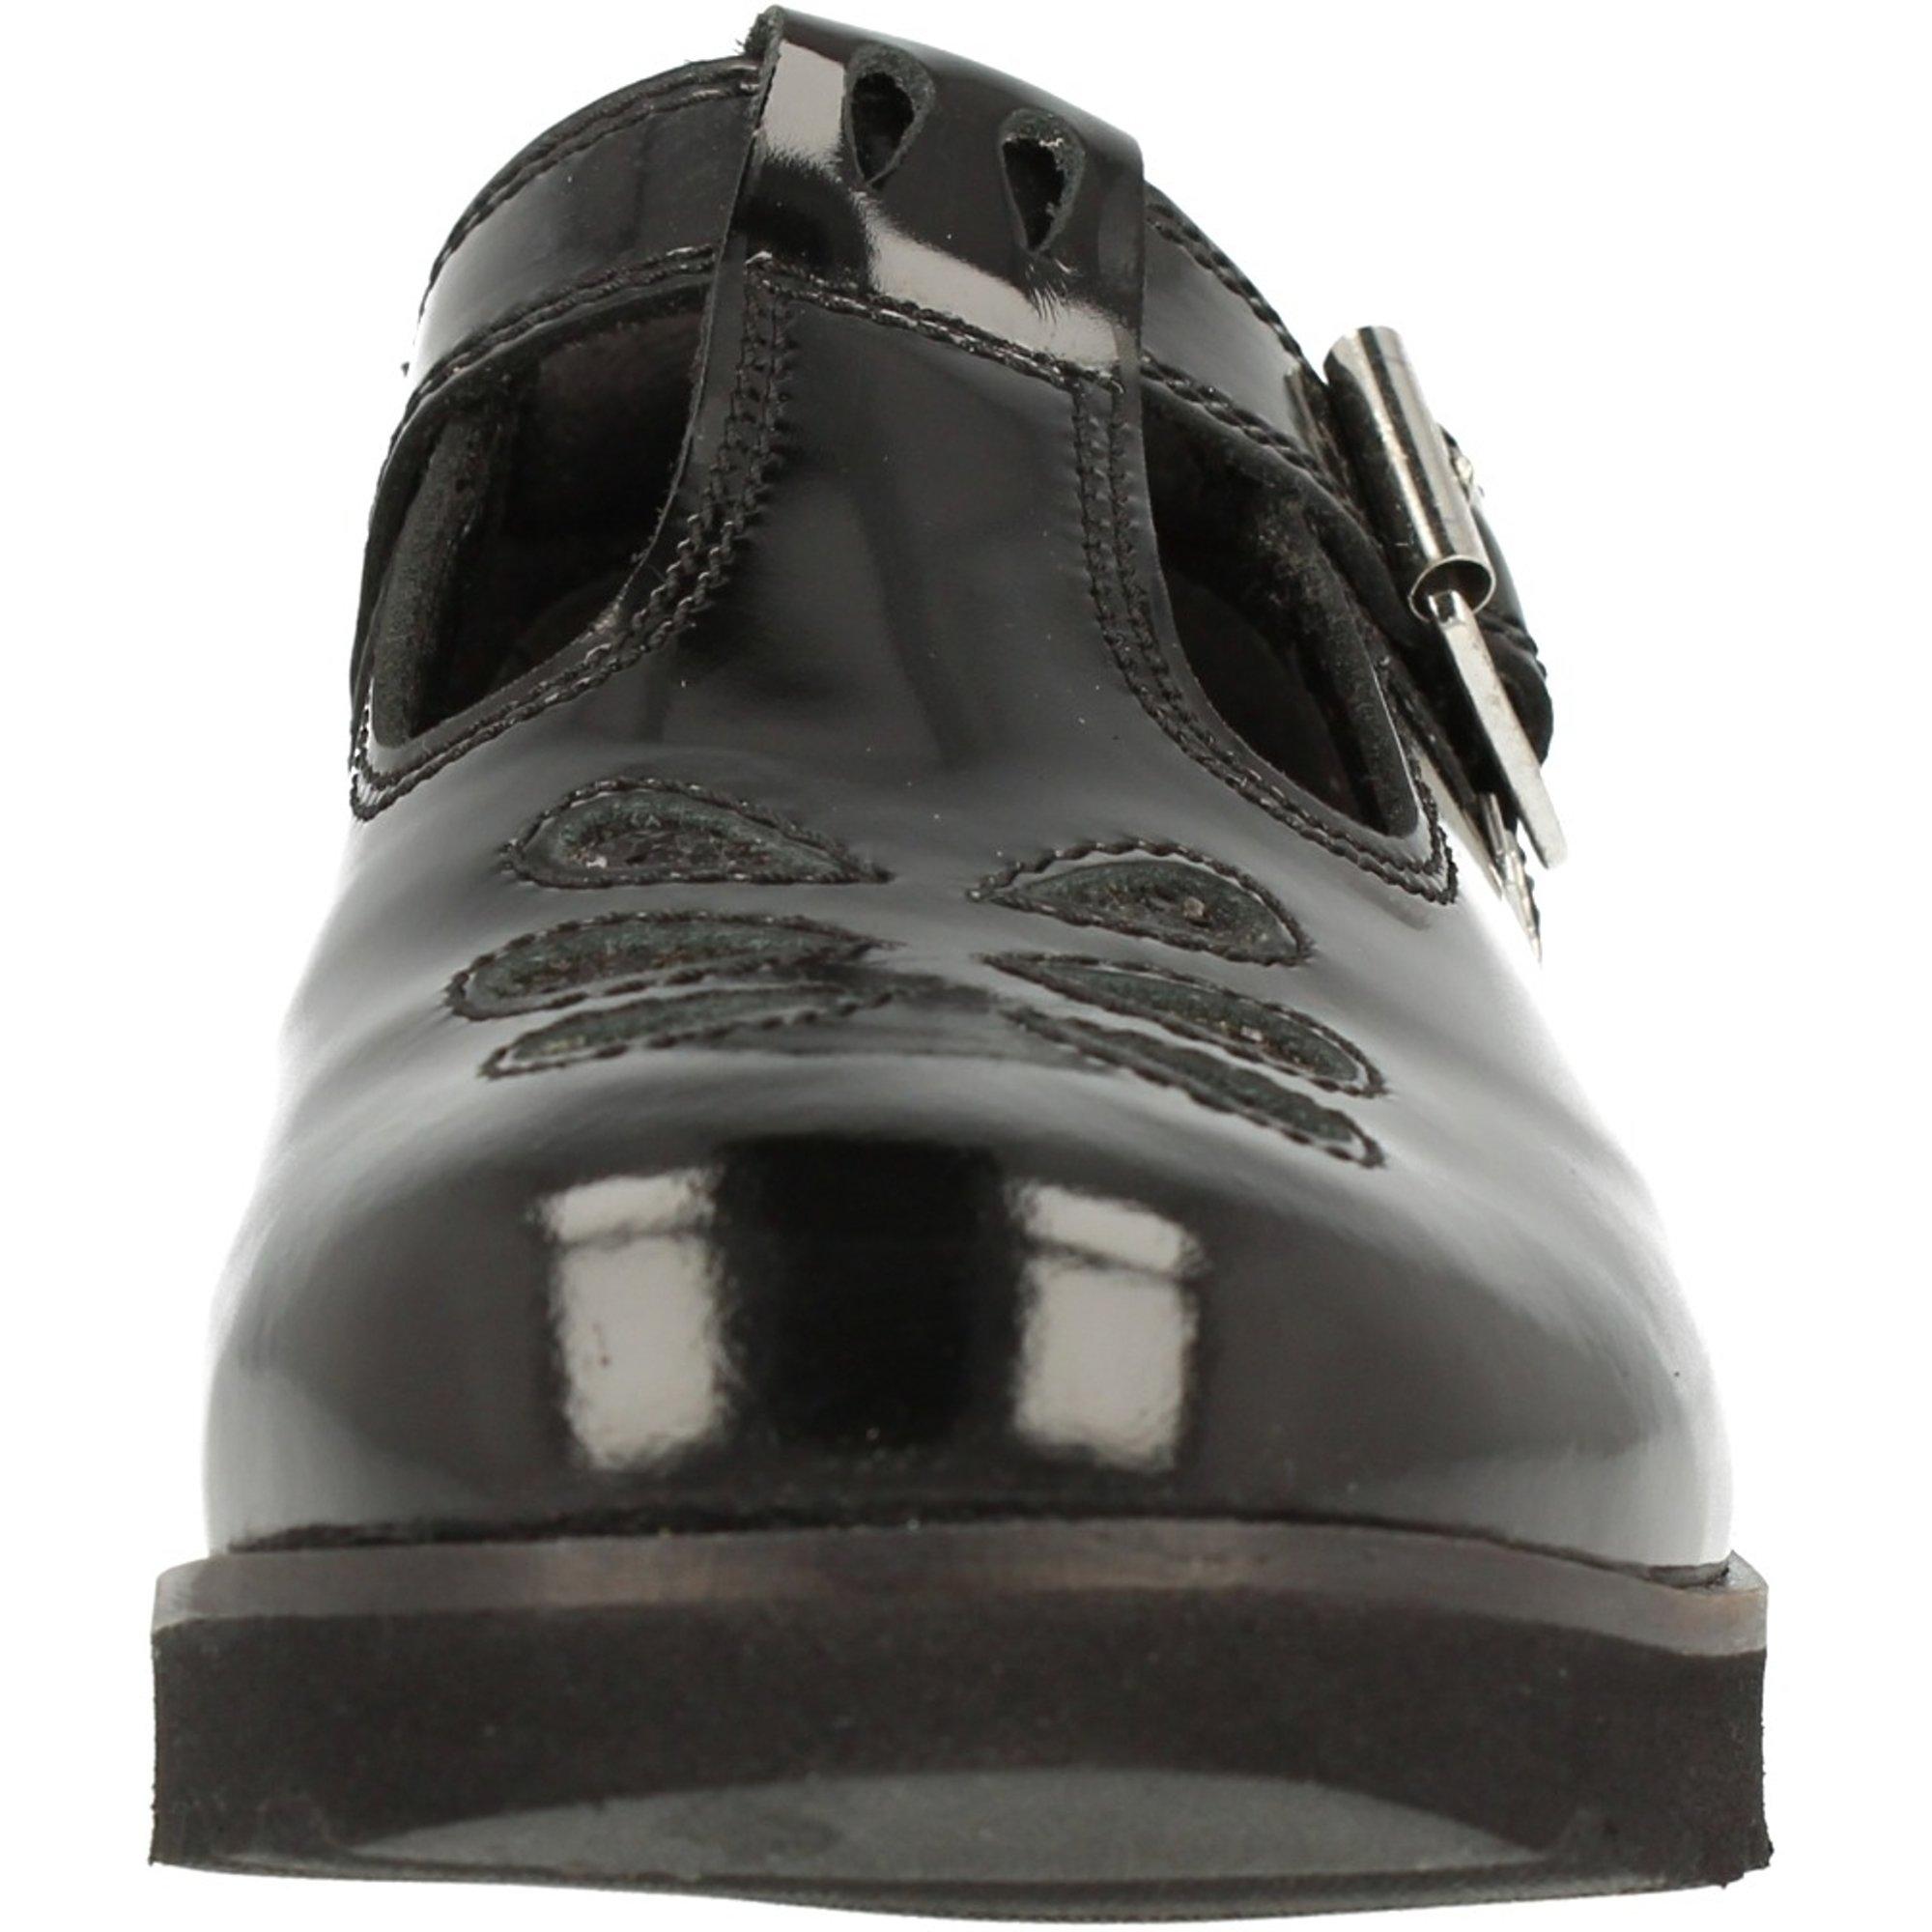 Kickers Kick C Lite T J Black Patent